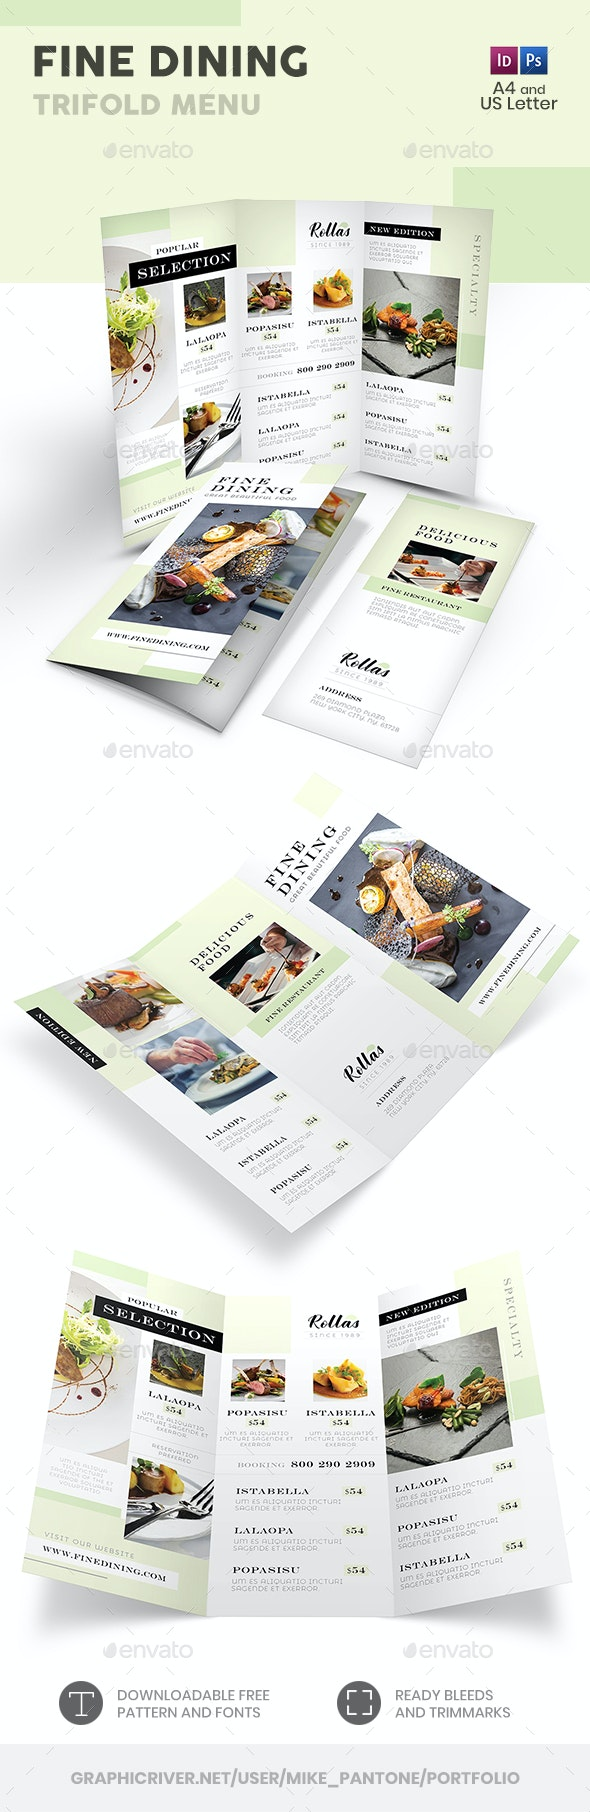 Fine Dining Trifold Menu - Food Menus Print Templates